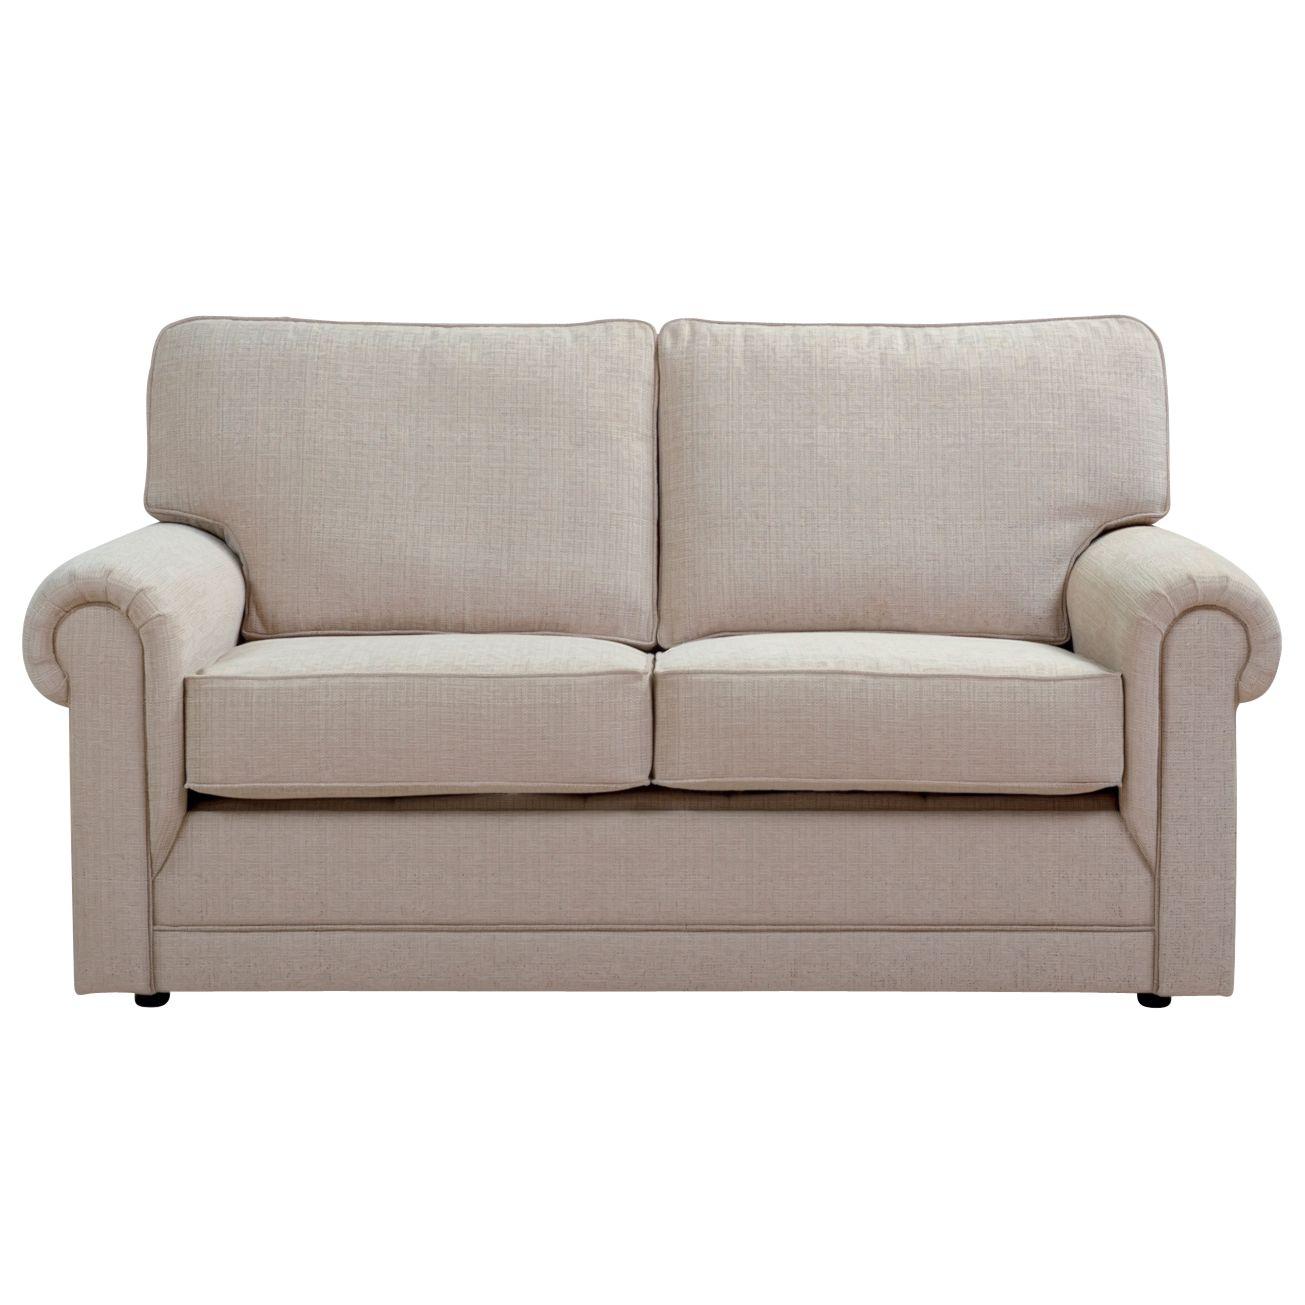 John Lewis Elgar Small Sofa Bed Pumice